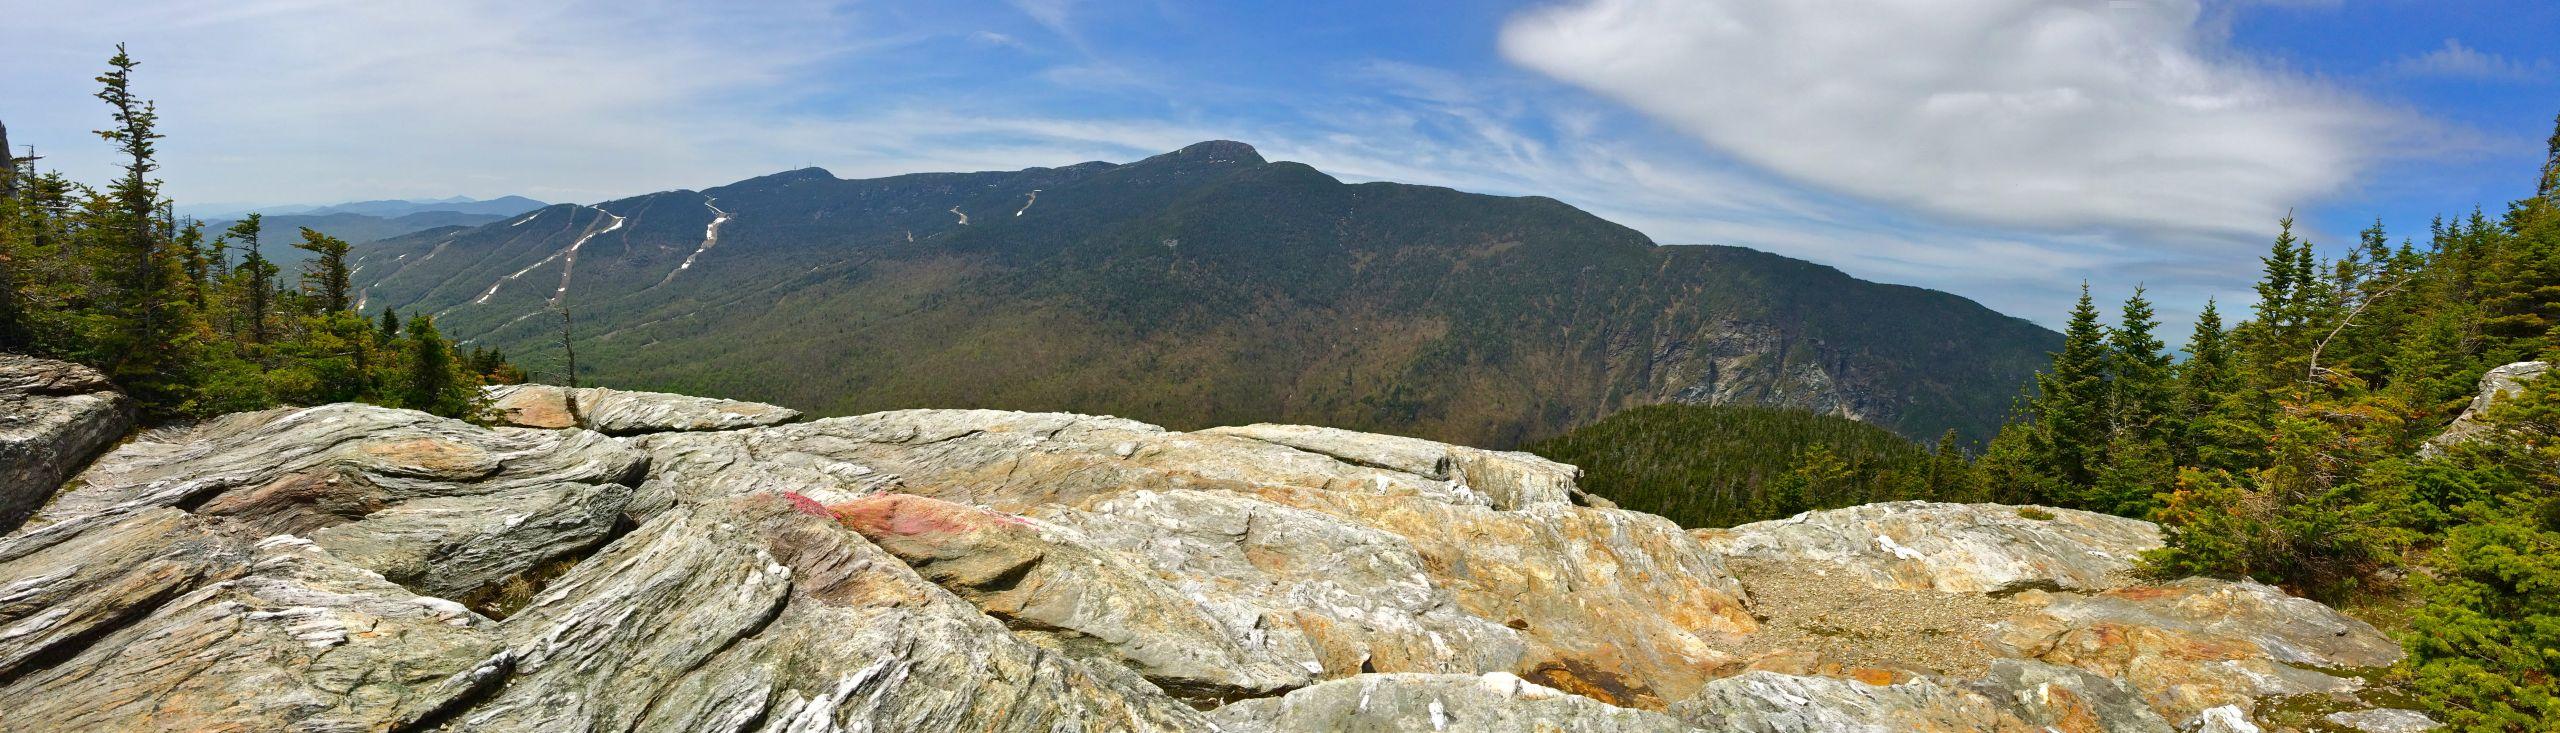 Spruce Peak Lookout